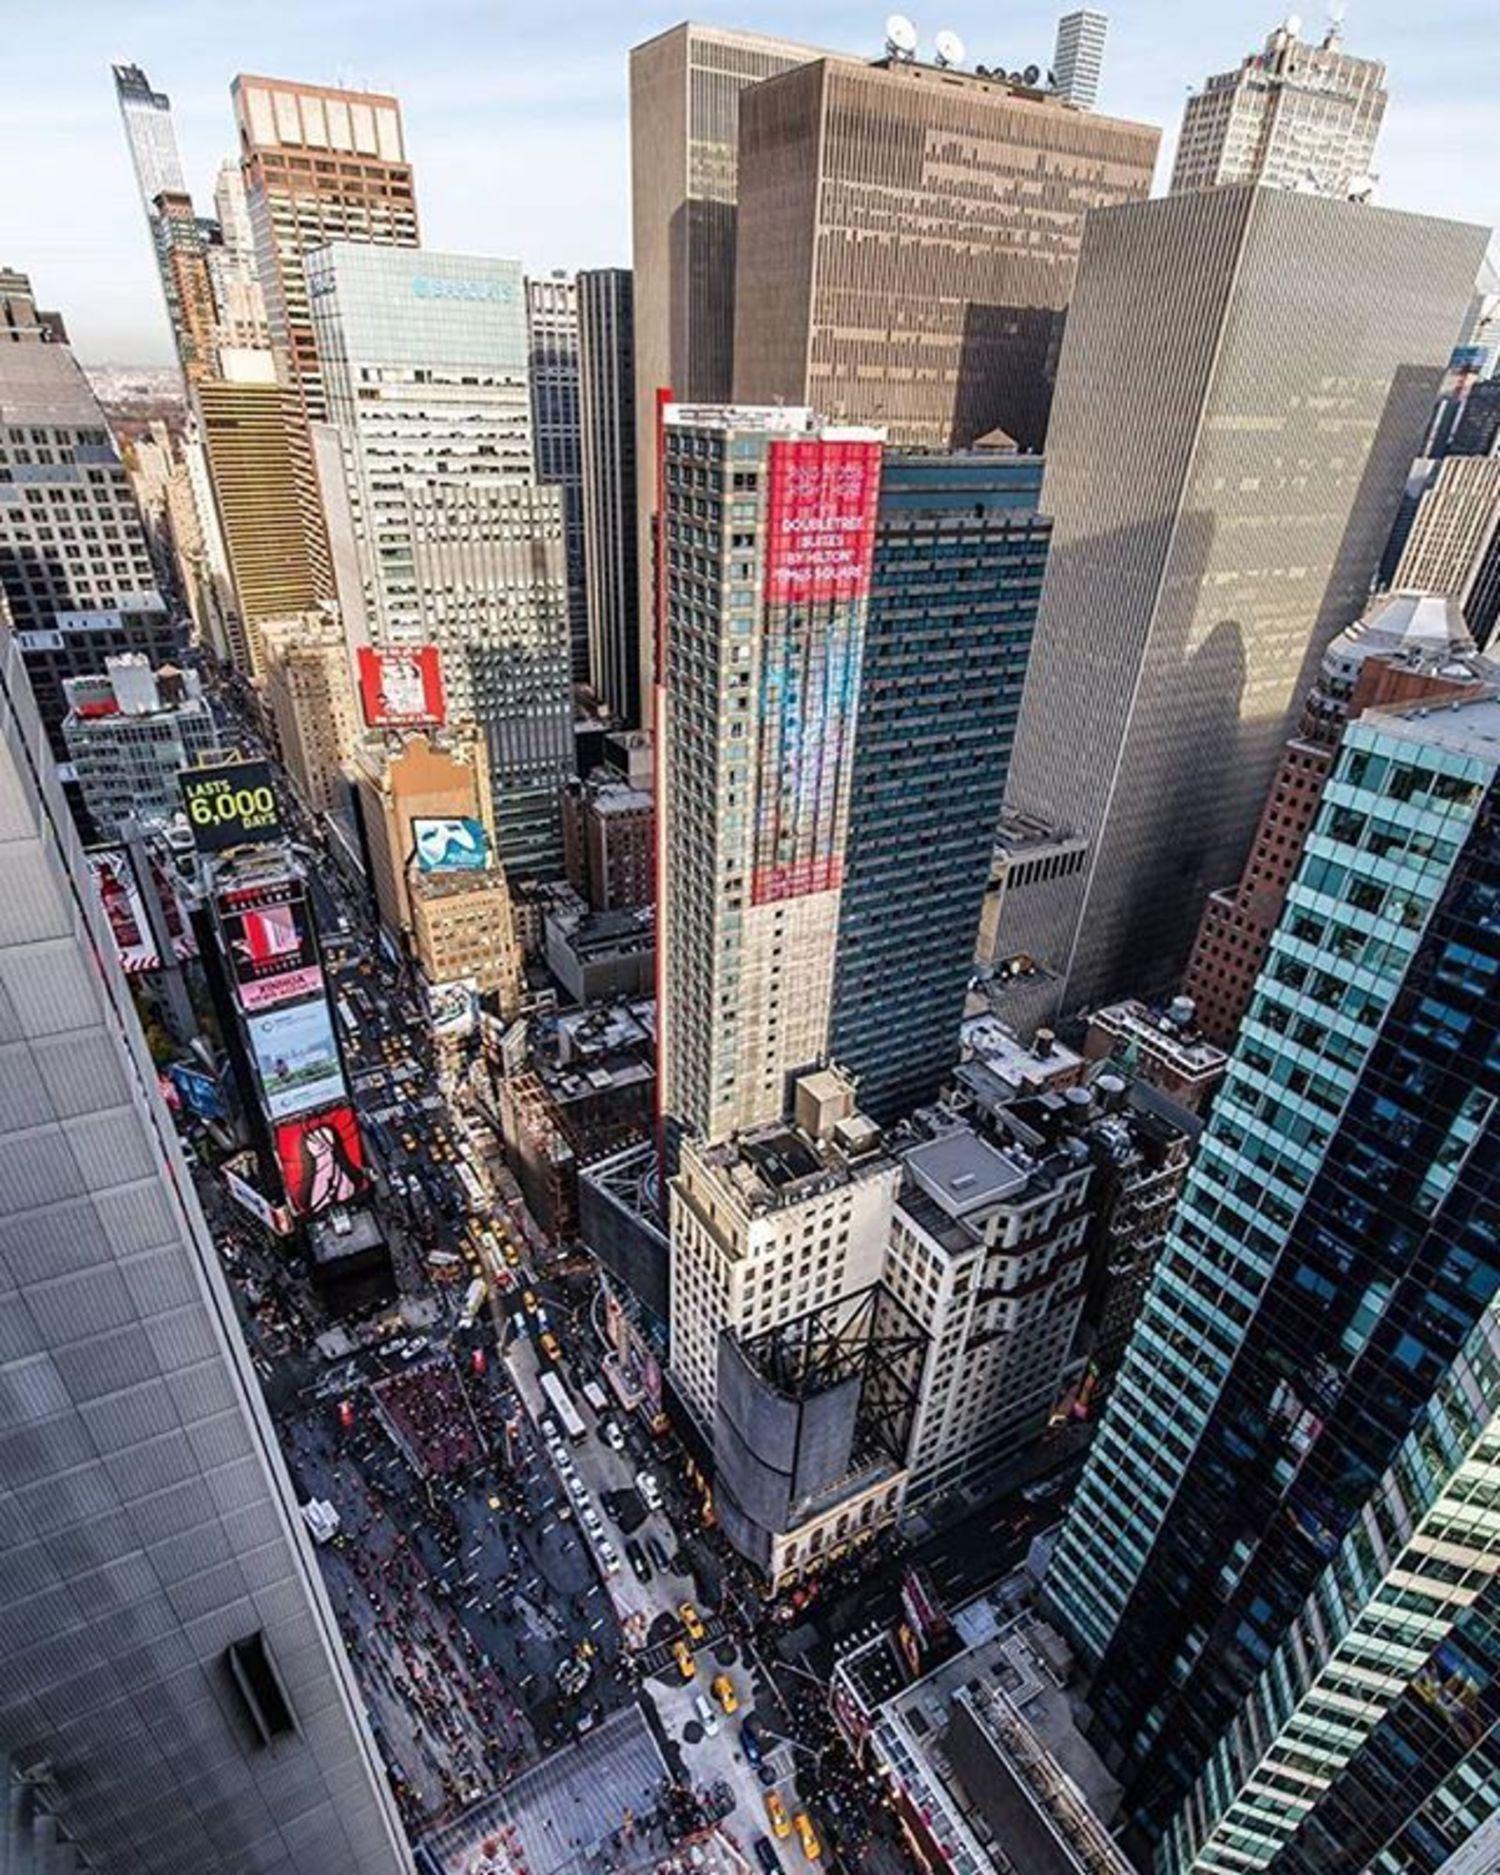 New York, New York. Photo via @lightsensitivity #viewingnyc #newyork #newyorkcity #nyc